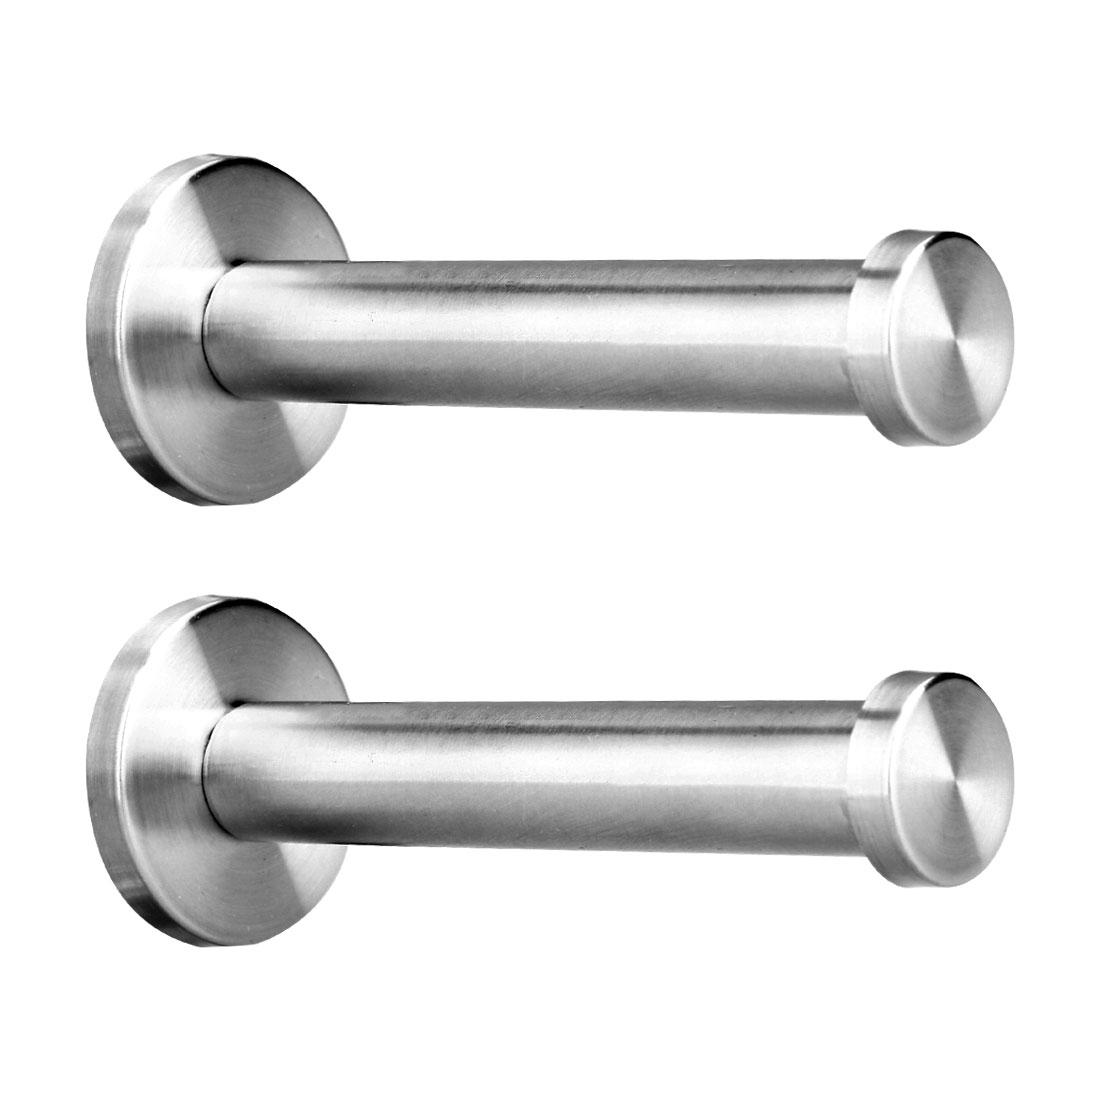 2pcs Wall Hooks Stainless Steel 205mm Hook Coat Towel Key DIY Hanger w Screws